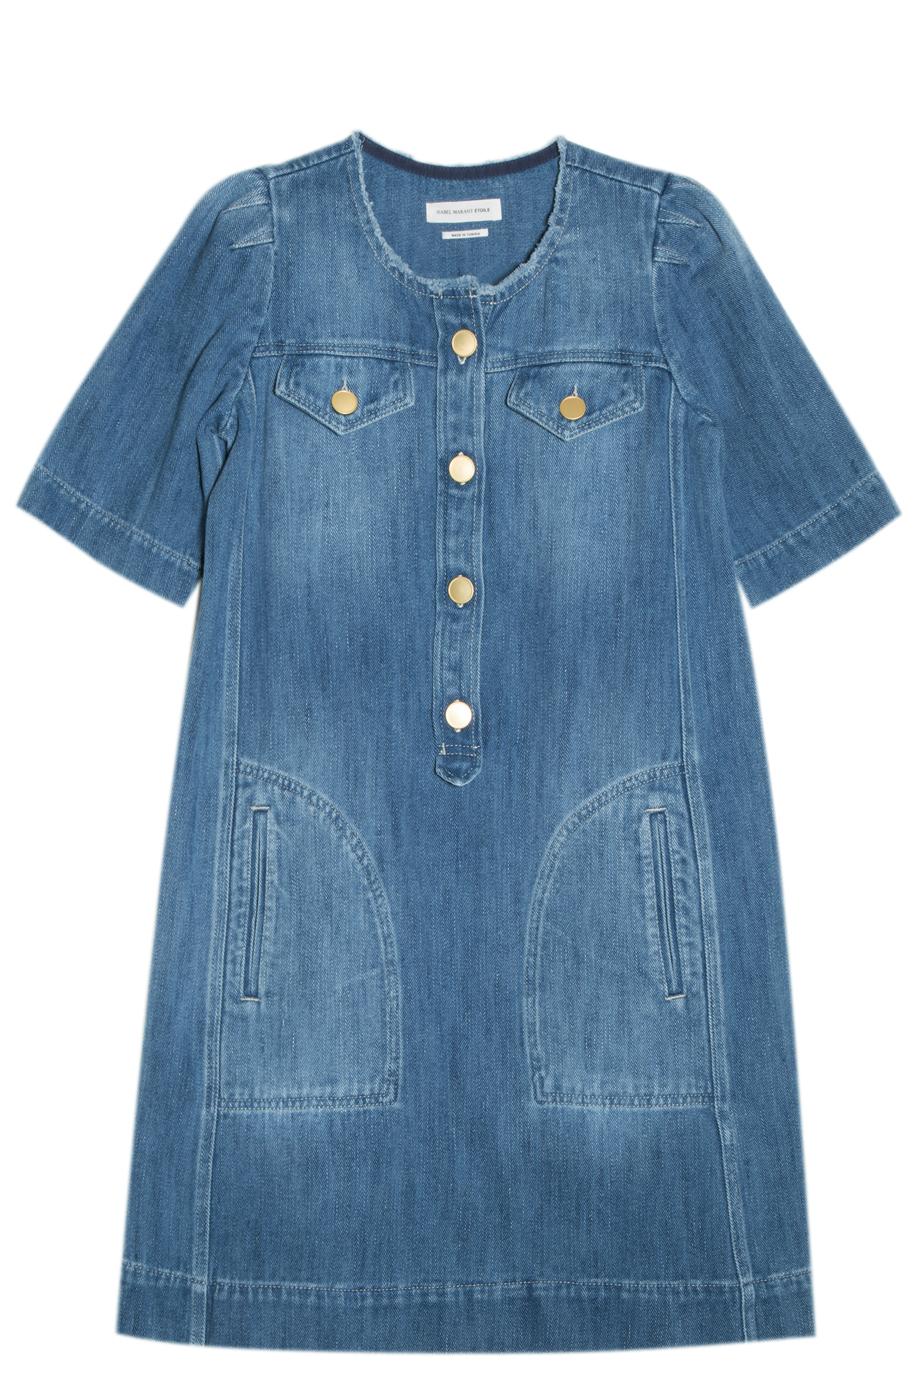 1808315161 Lyst - Étoile Isabel Marant Oriane Denim Dress in Blue